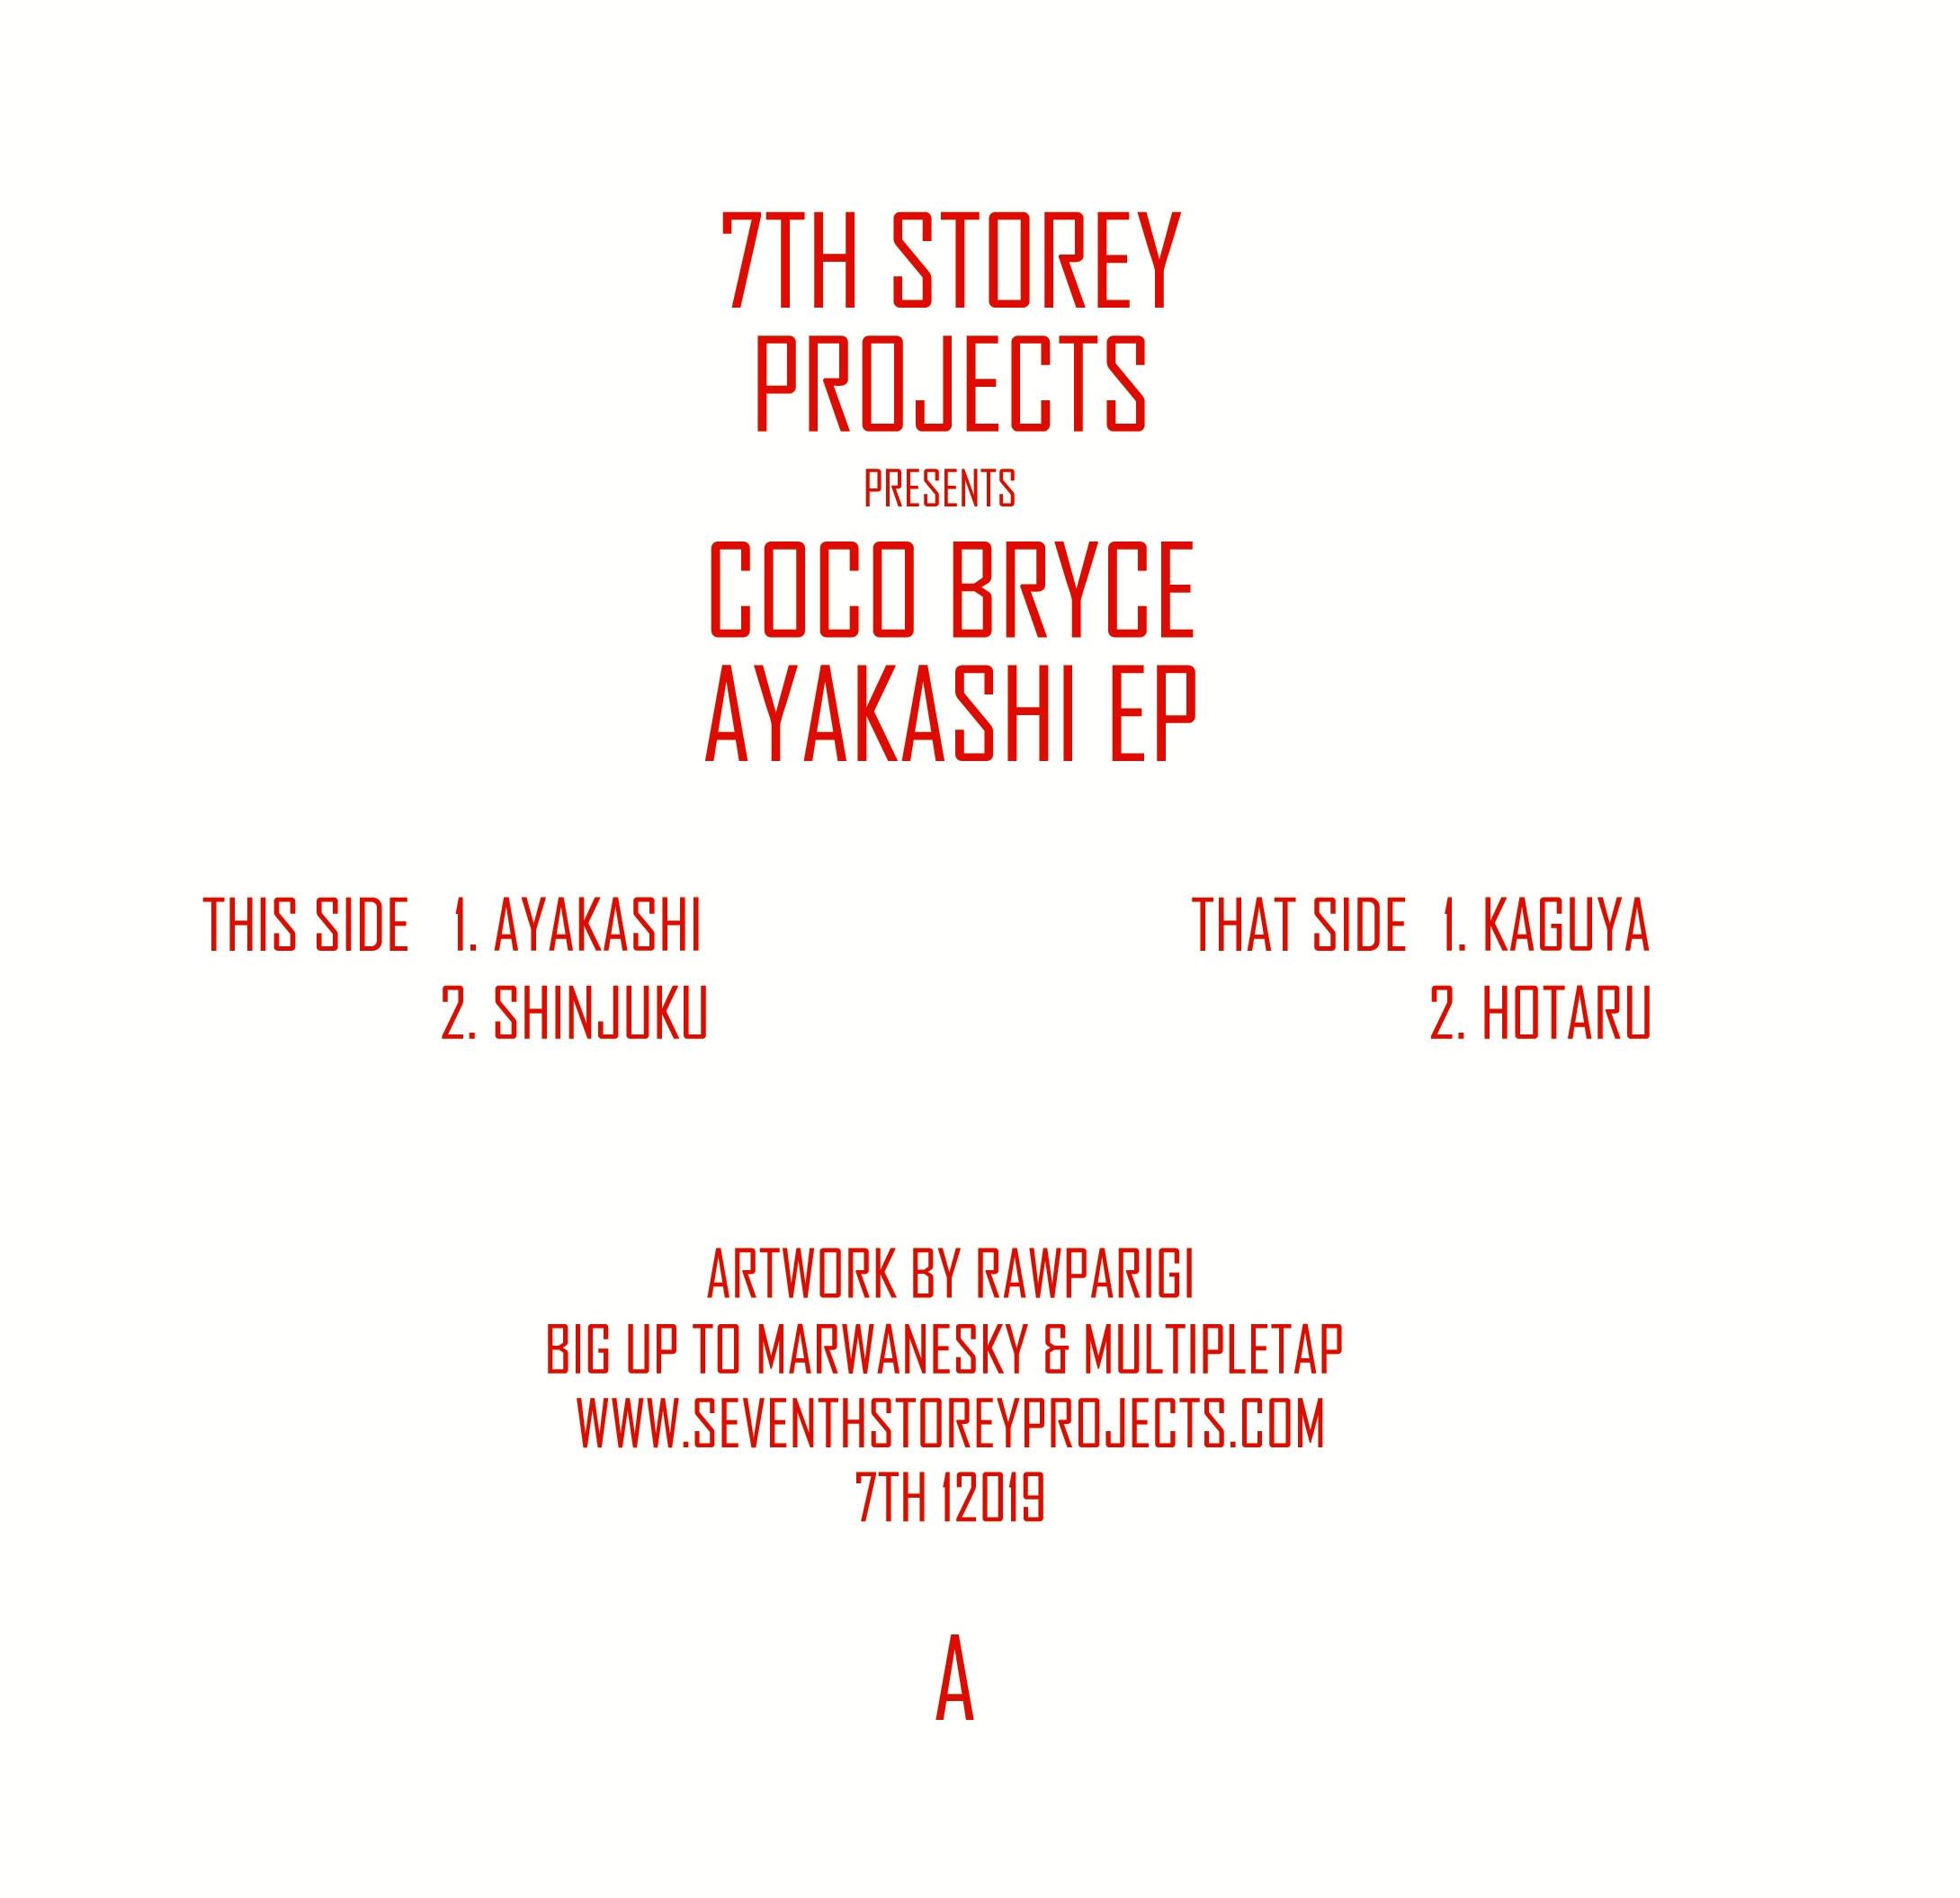 COCO BRYCE - The Ayakashi EP